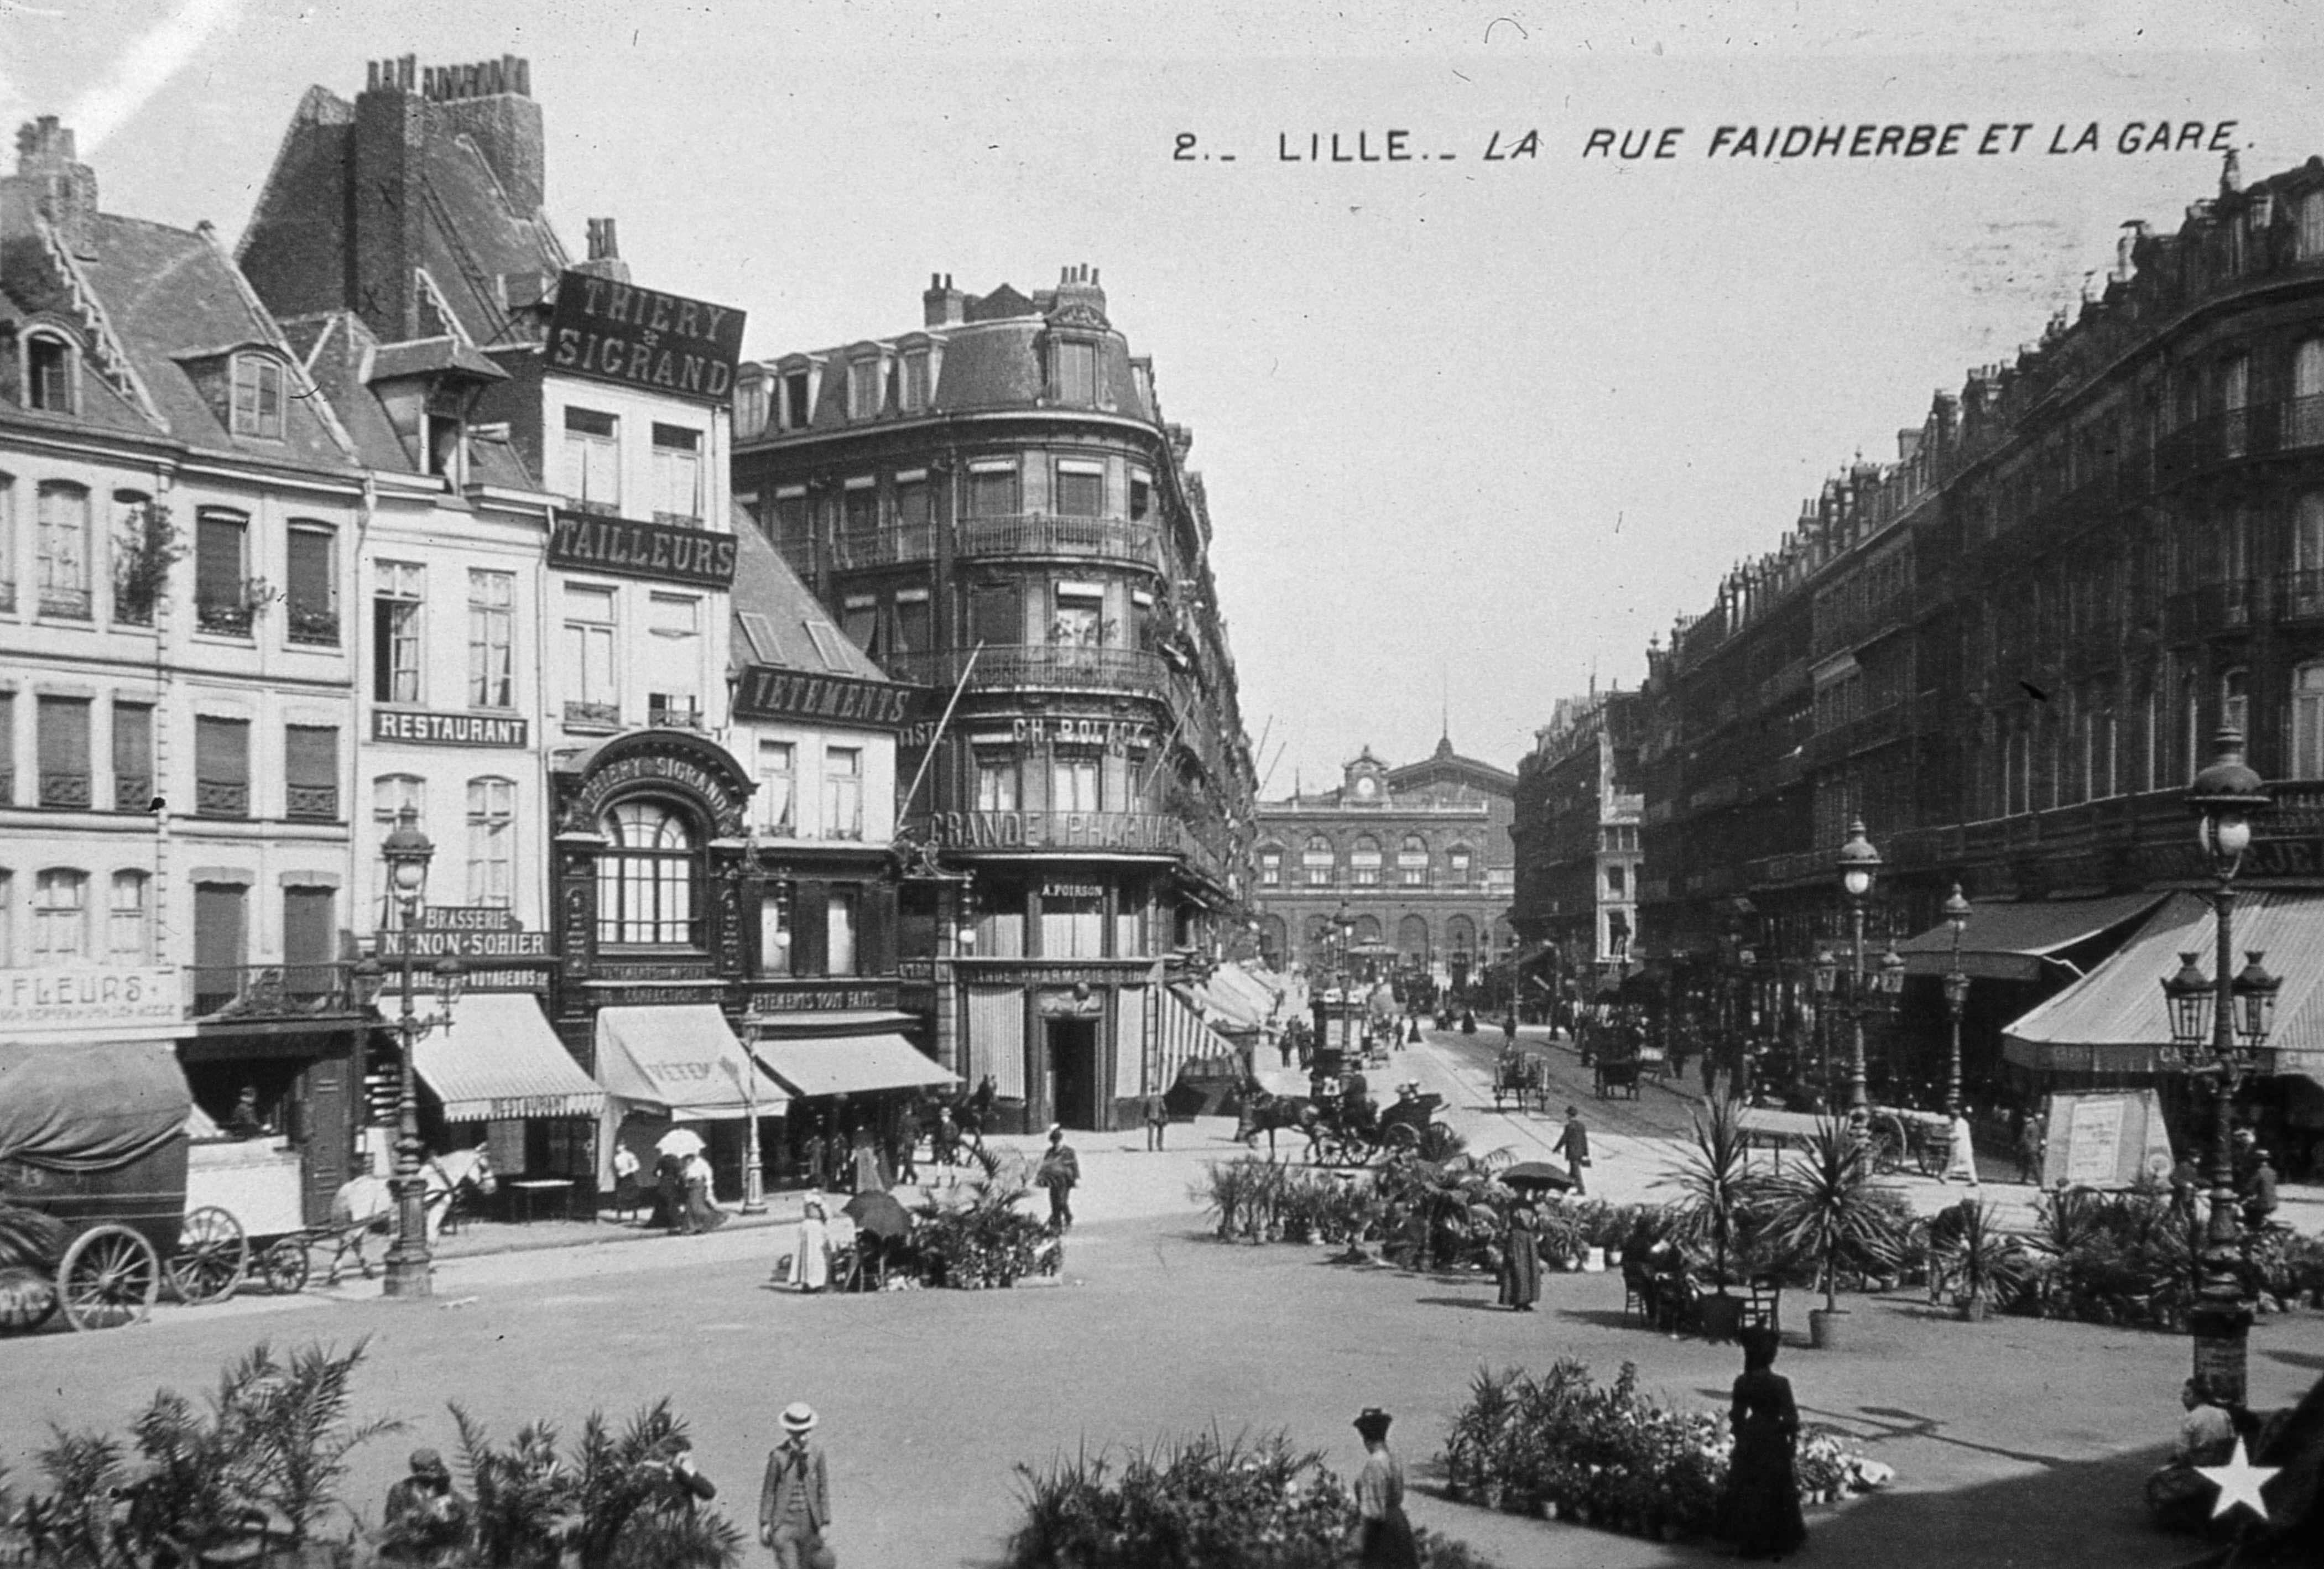 lille rue faidherbe avant 1907 lille france history pinterest lille monuments et ancien. Black Bedroom Furniture Sets. Home Design Ideas